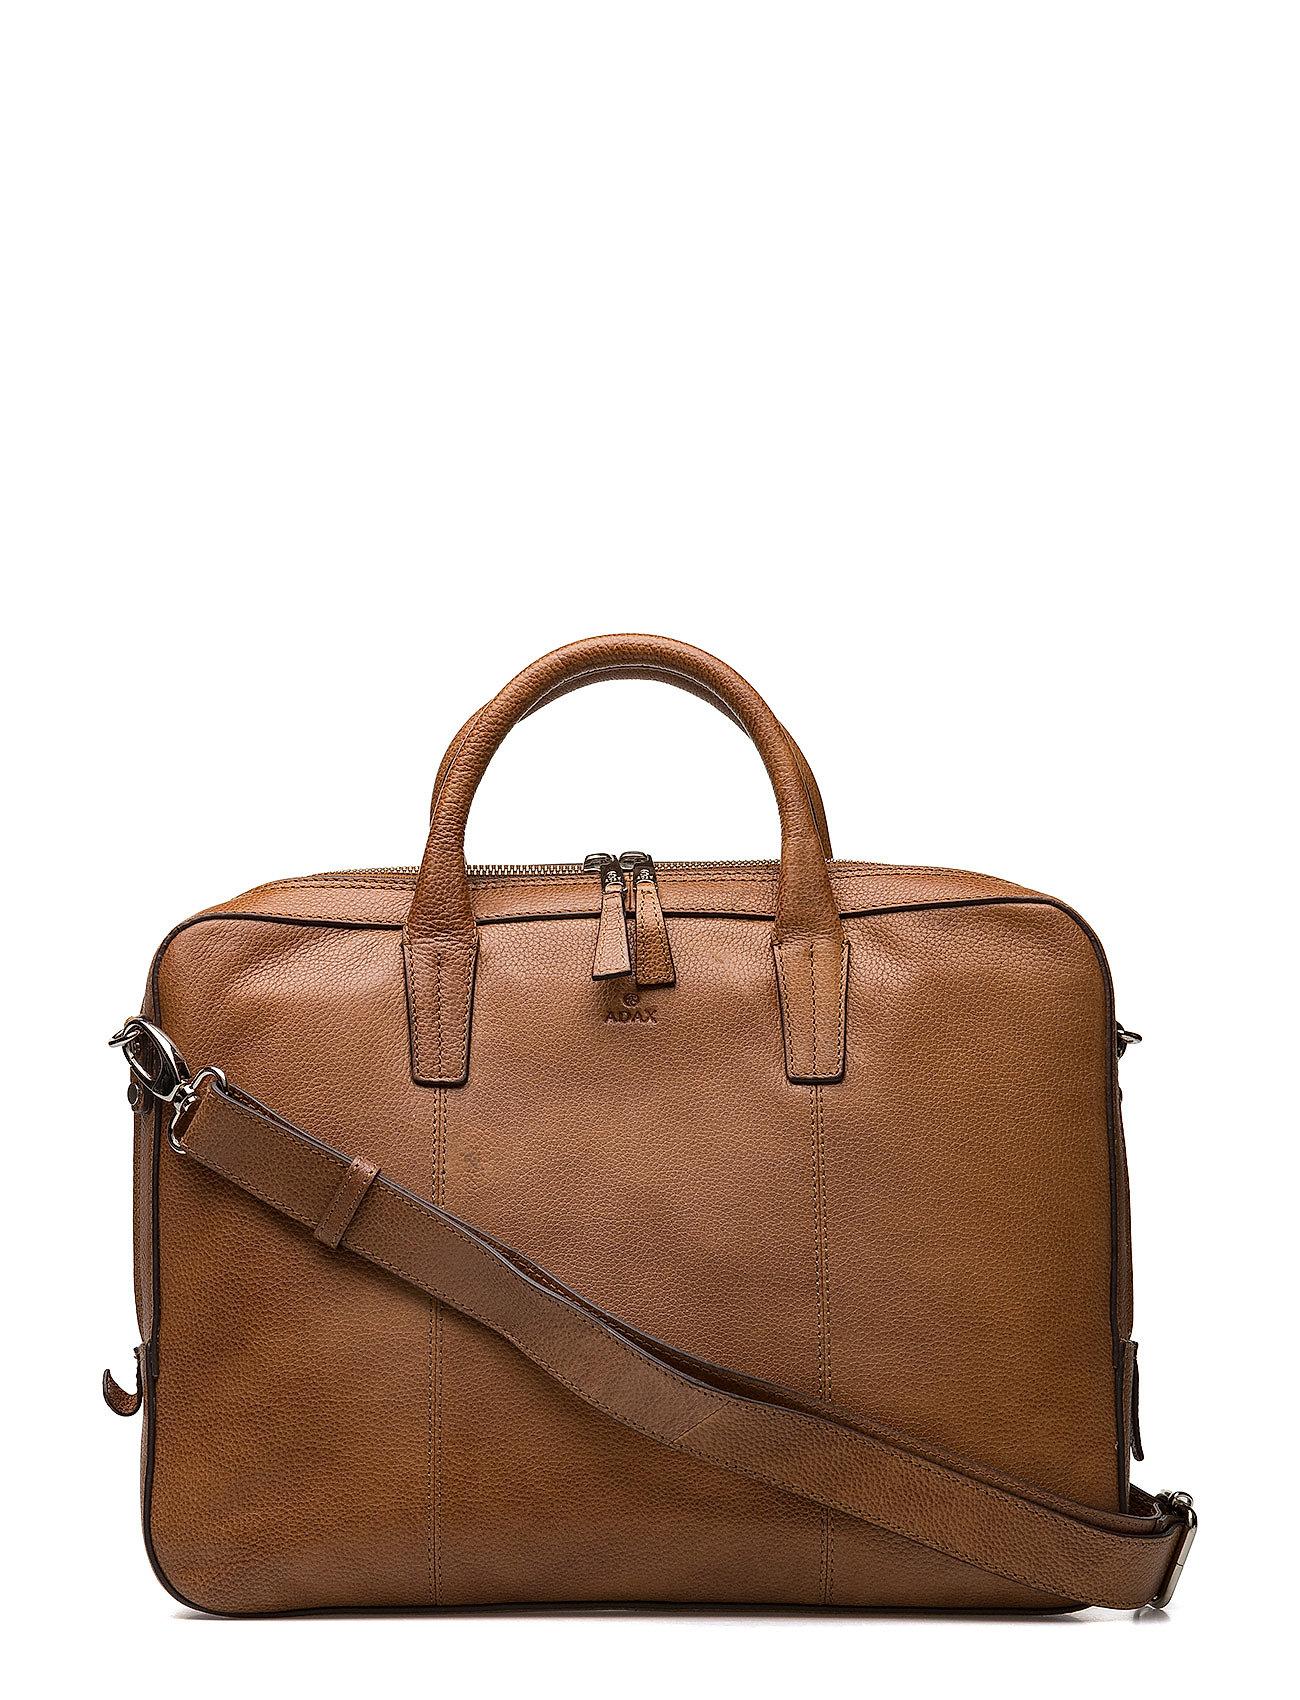 Napoli Working Bag Glenn 14 - Adax